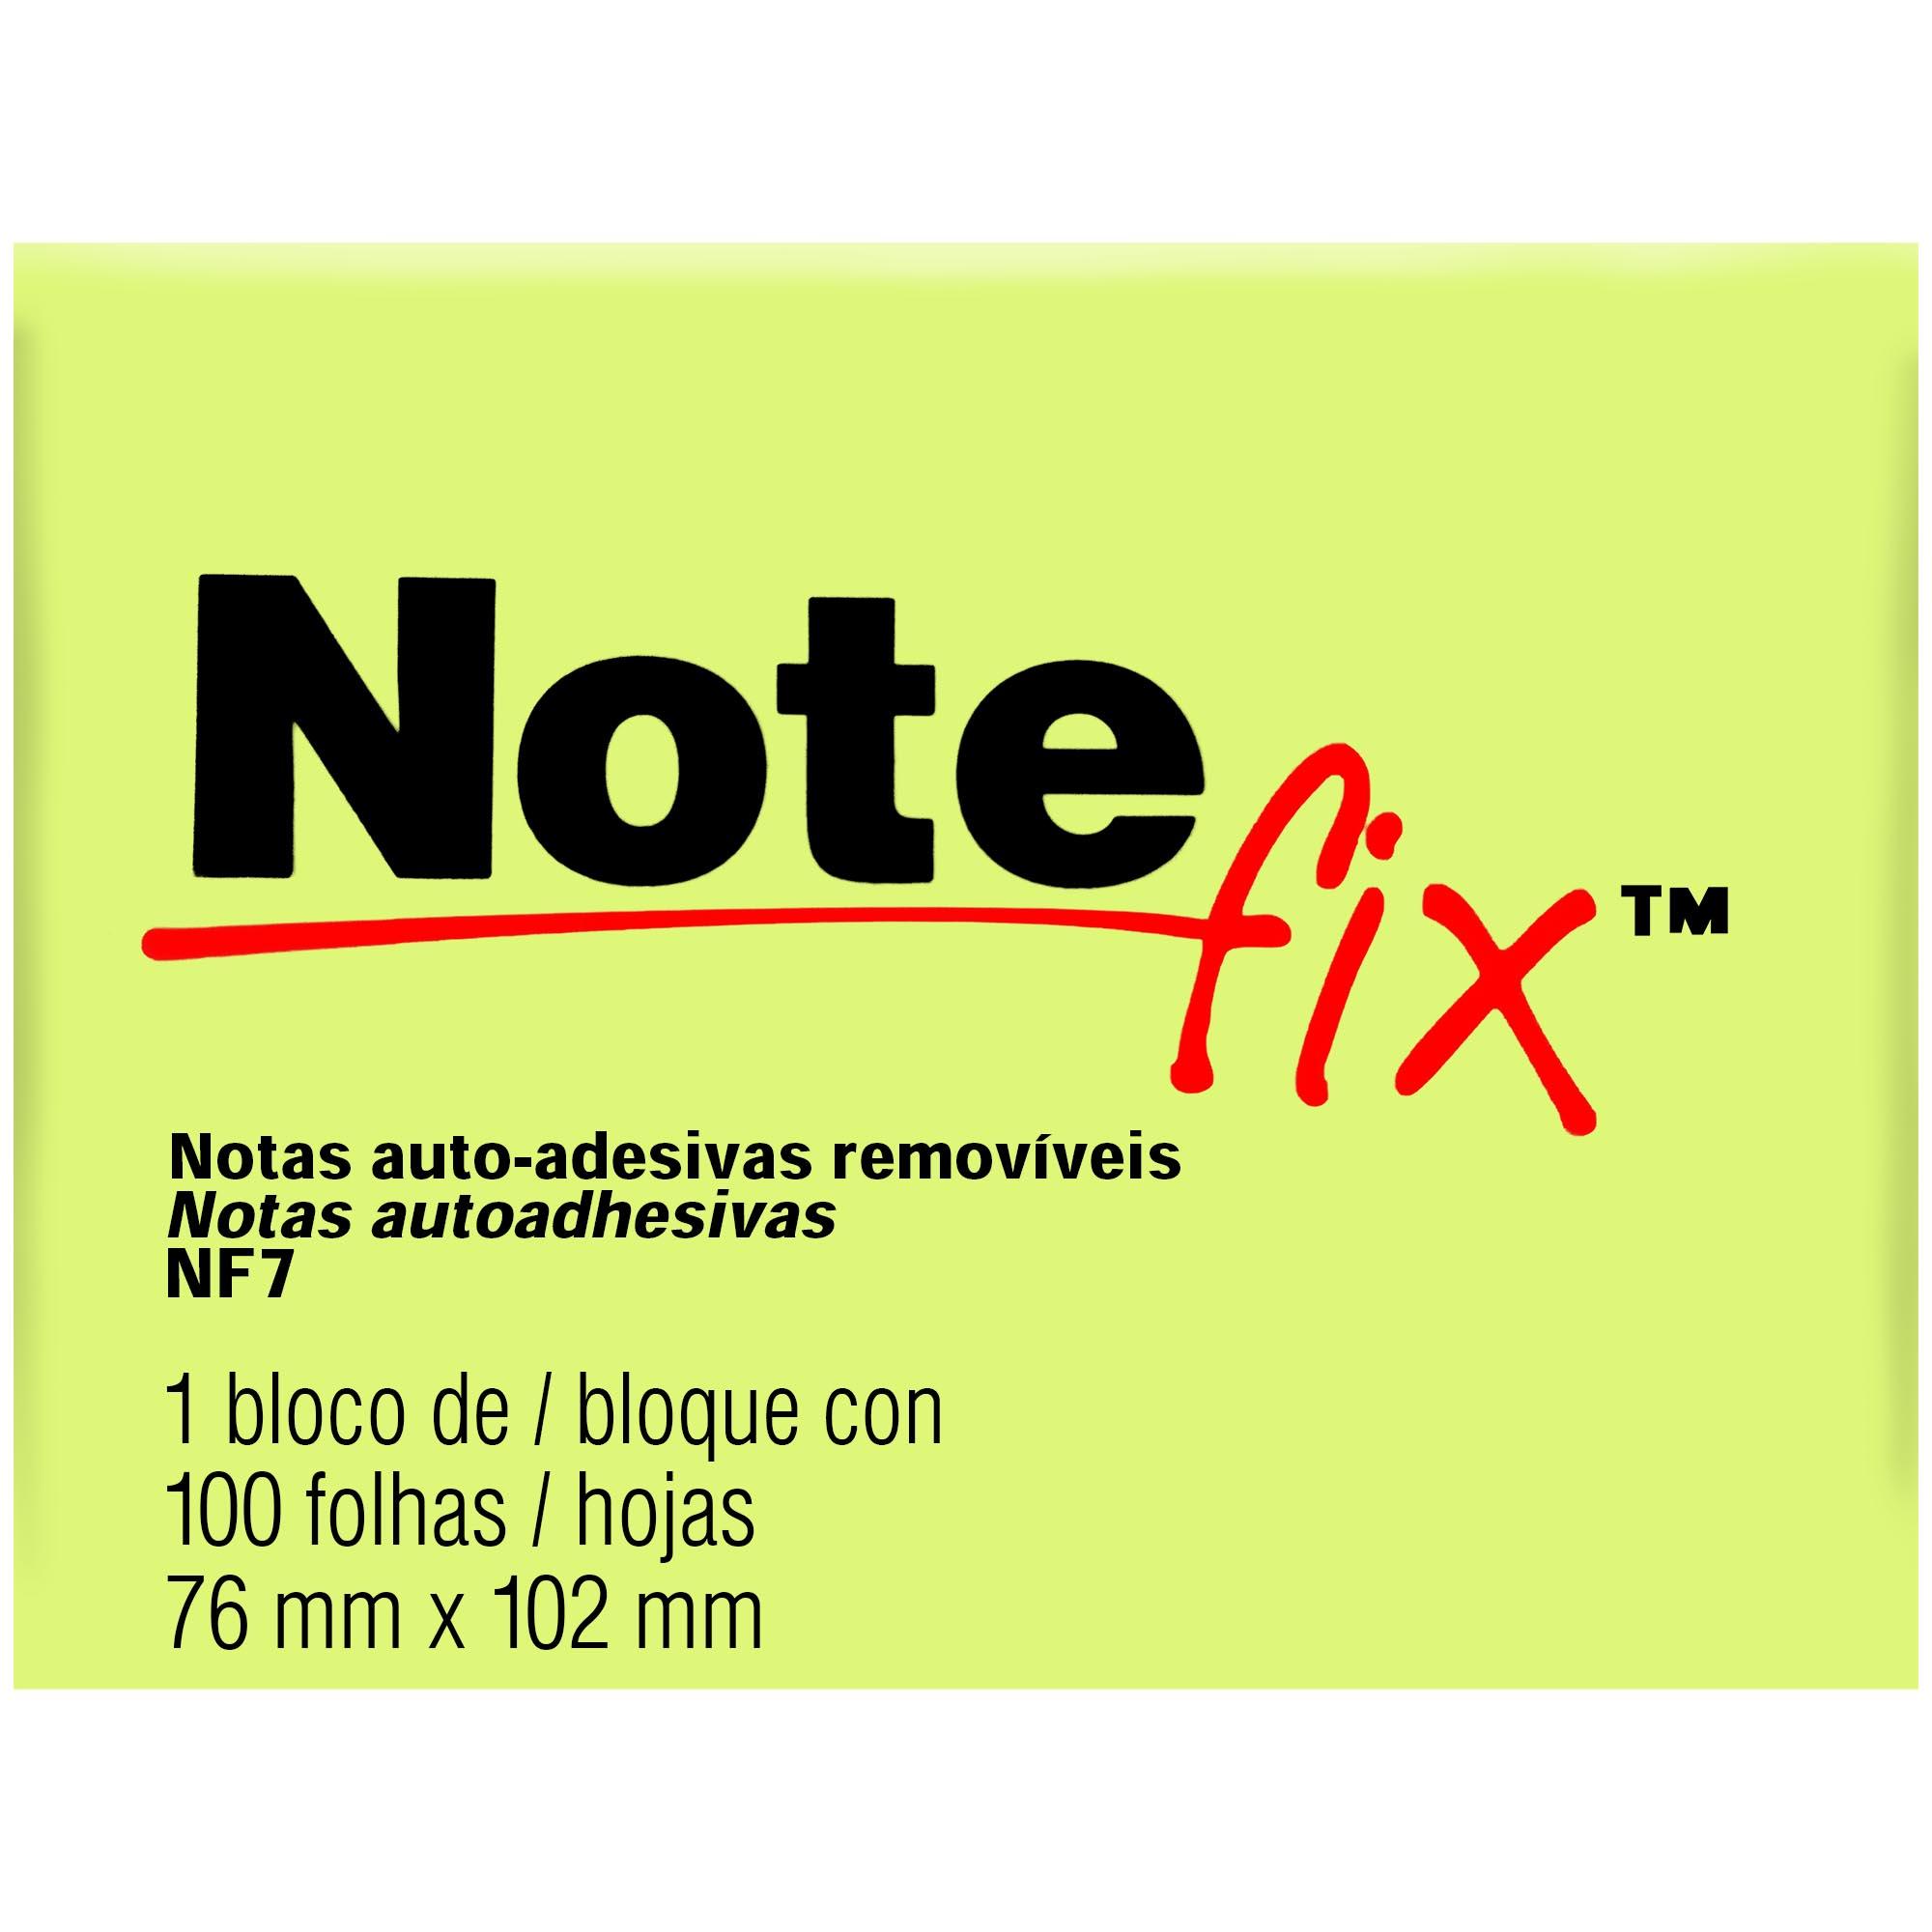 Bloco Autoadesivo Notefix NFX7 76MMX102MM 100FLS Cor Amarelo HB004088702 - 3M